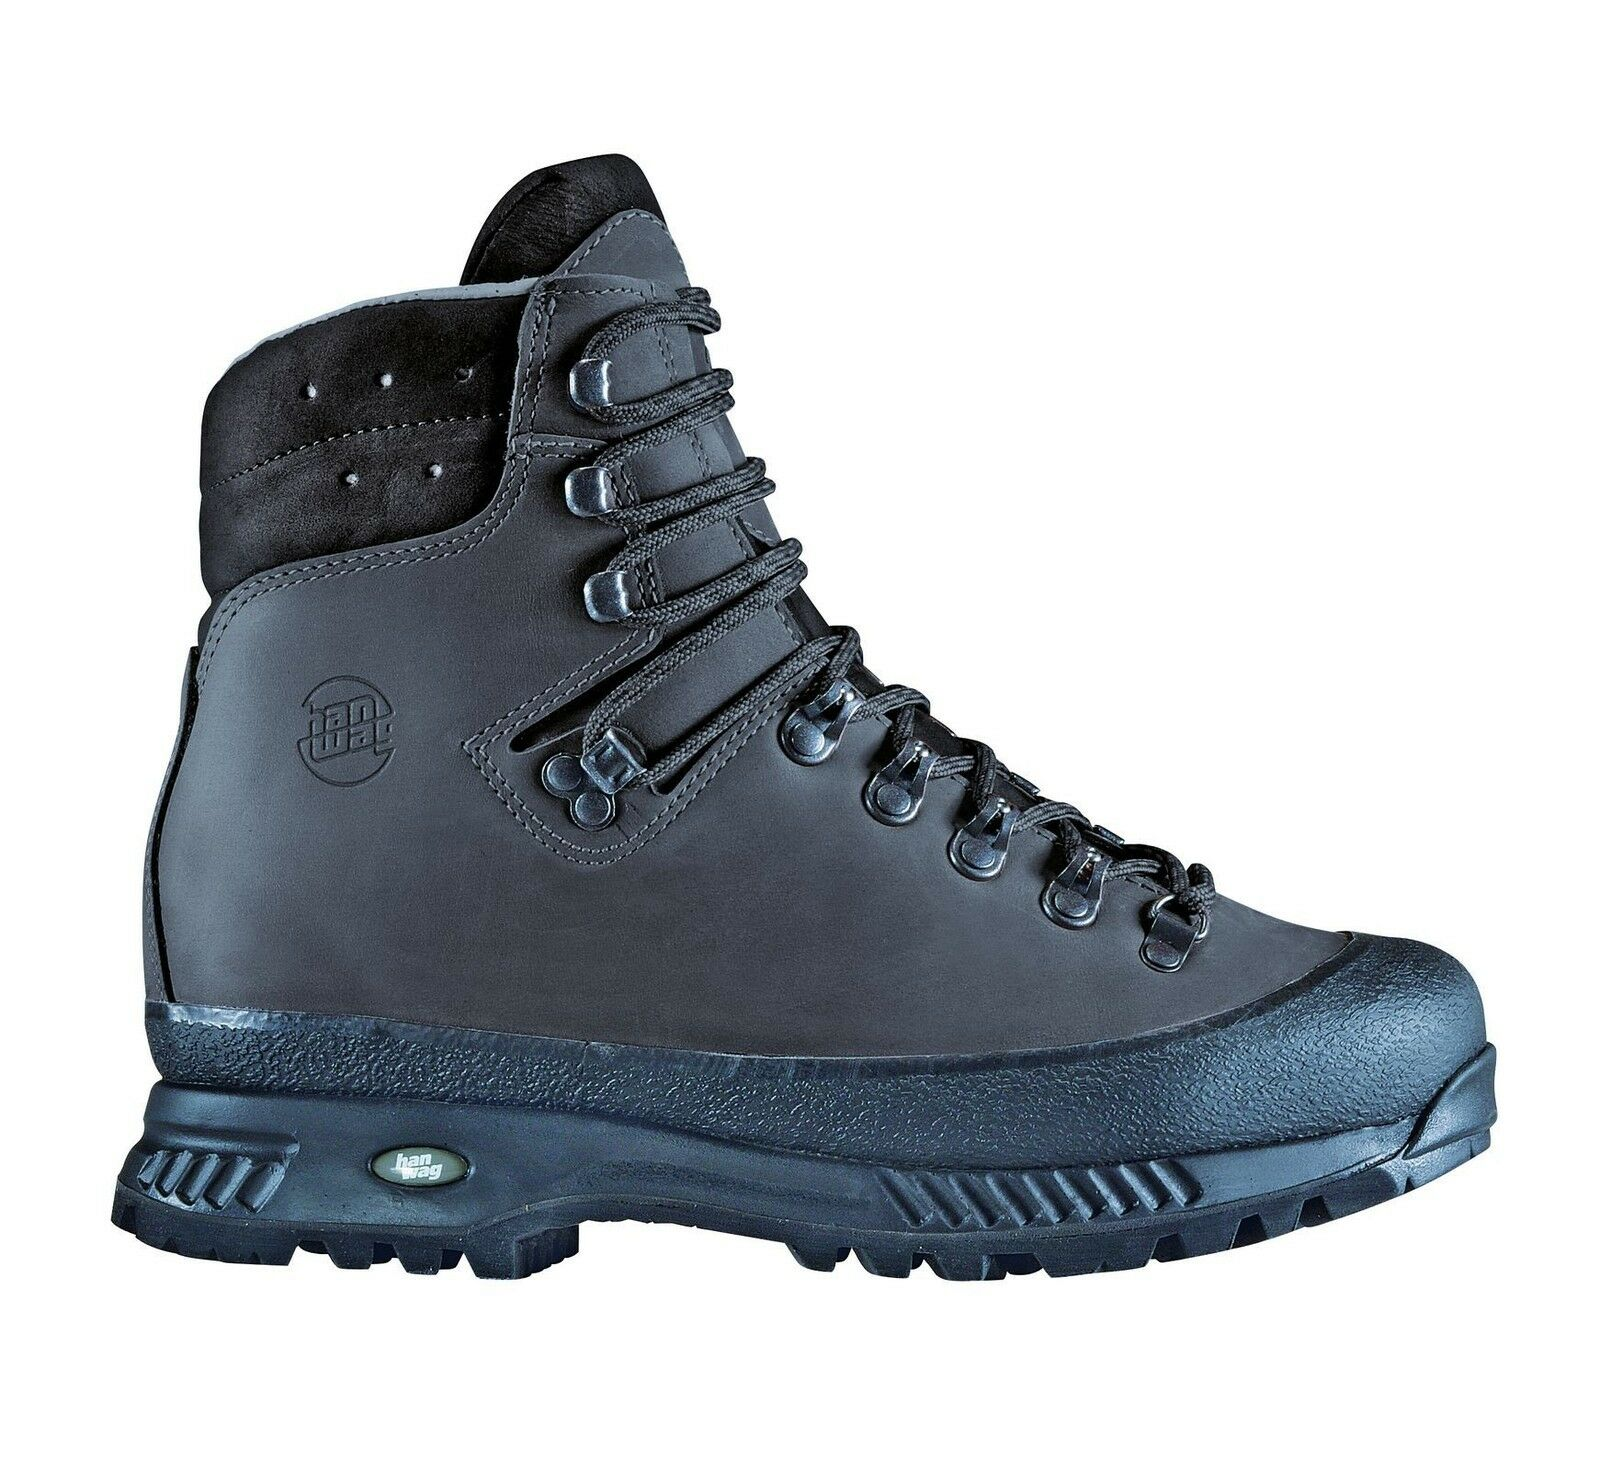 Hanwag Mountain shoes  Yukon Men Leather Size 11 - 46 Ash